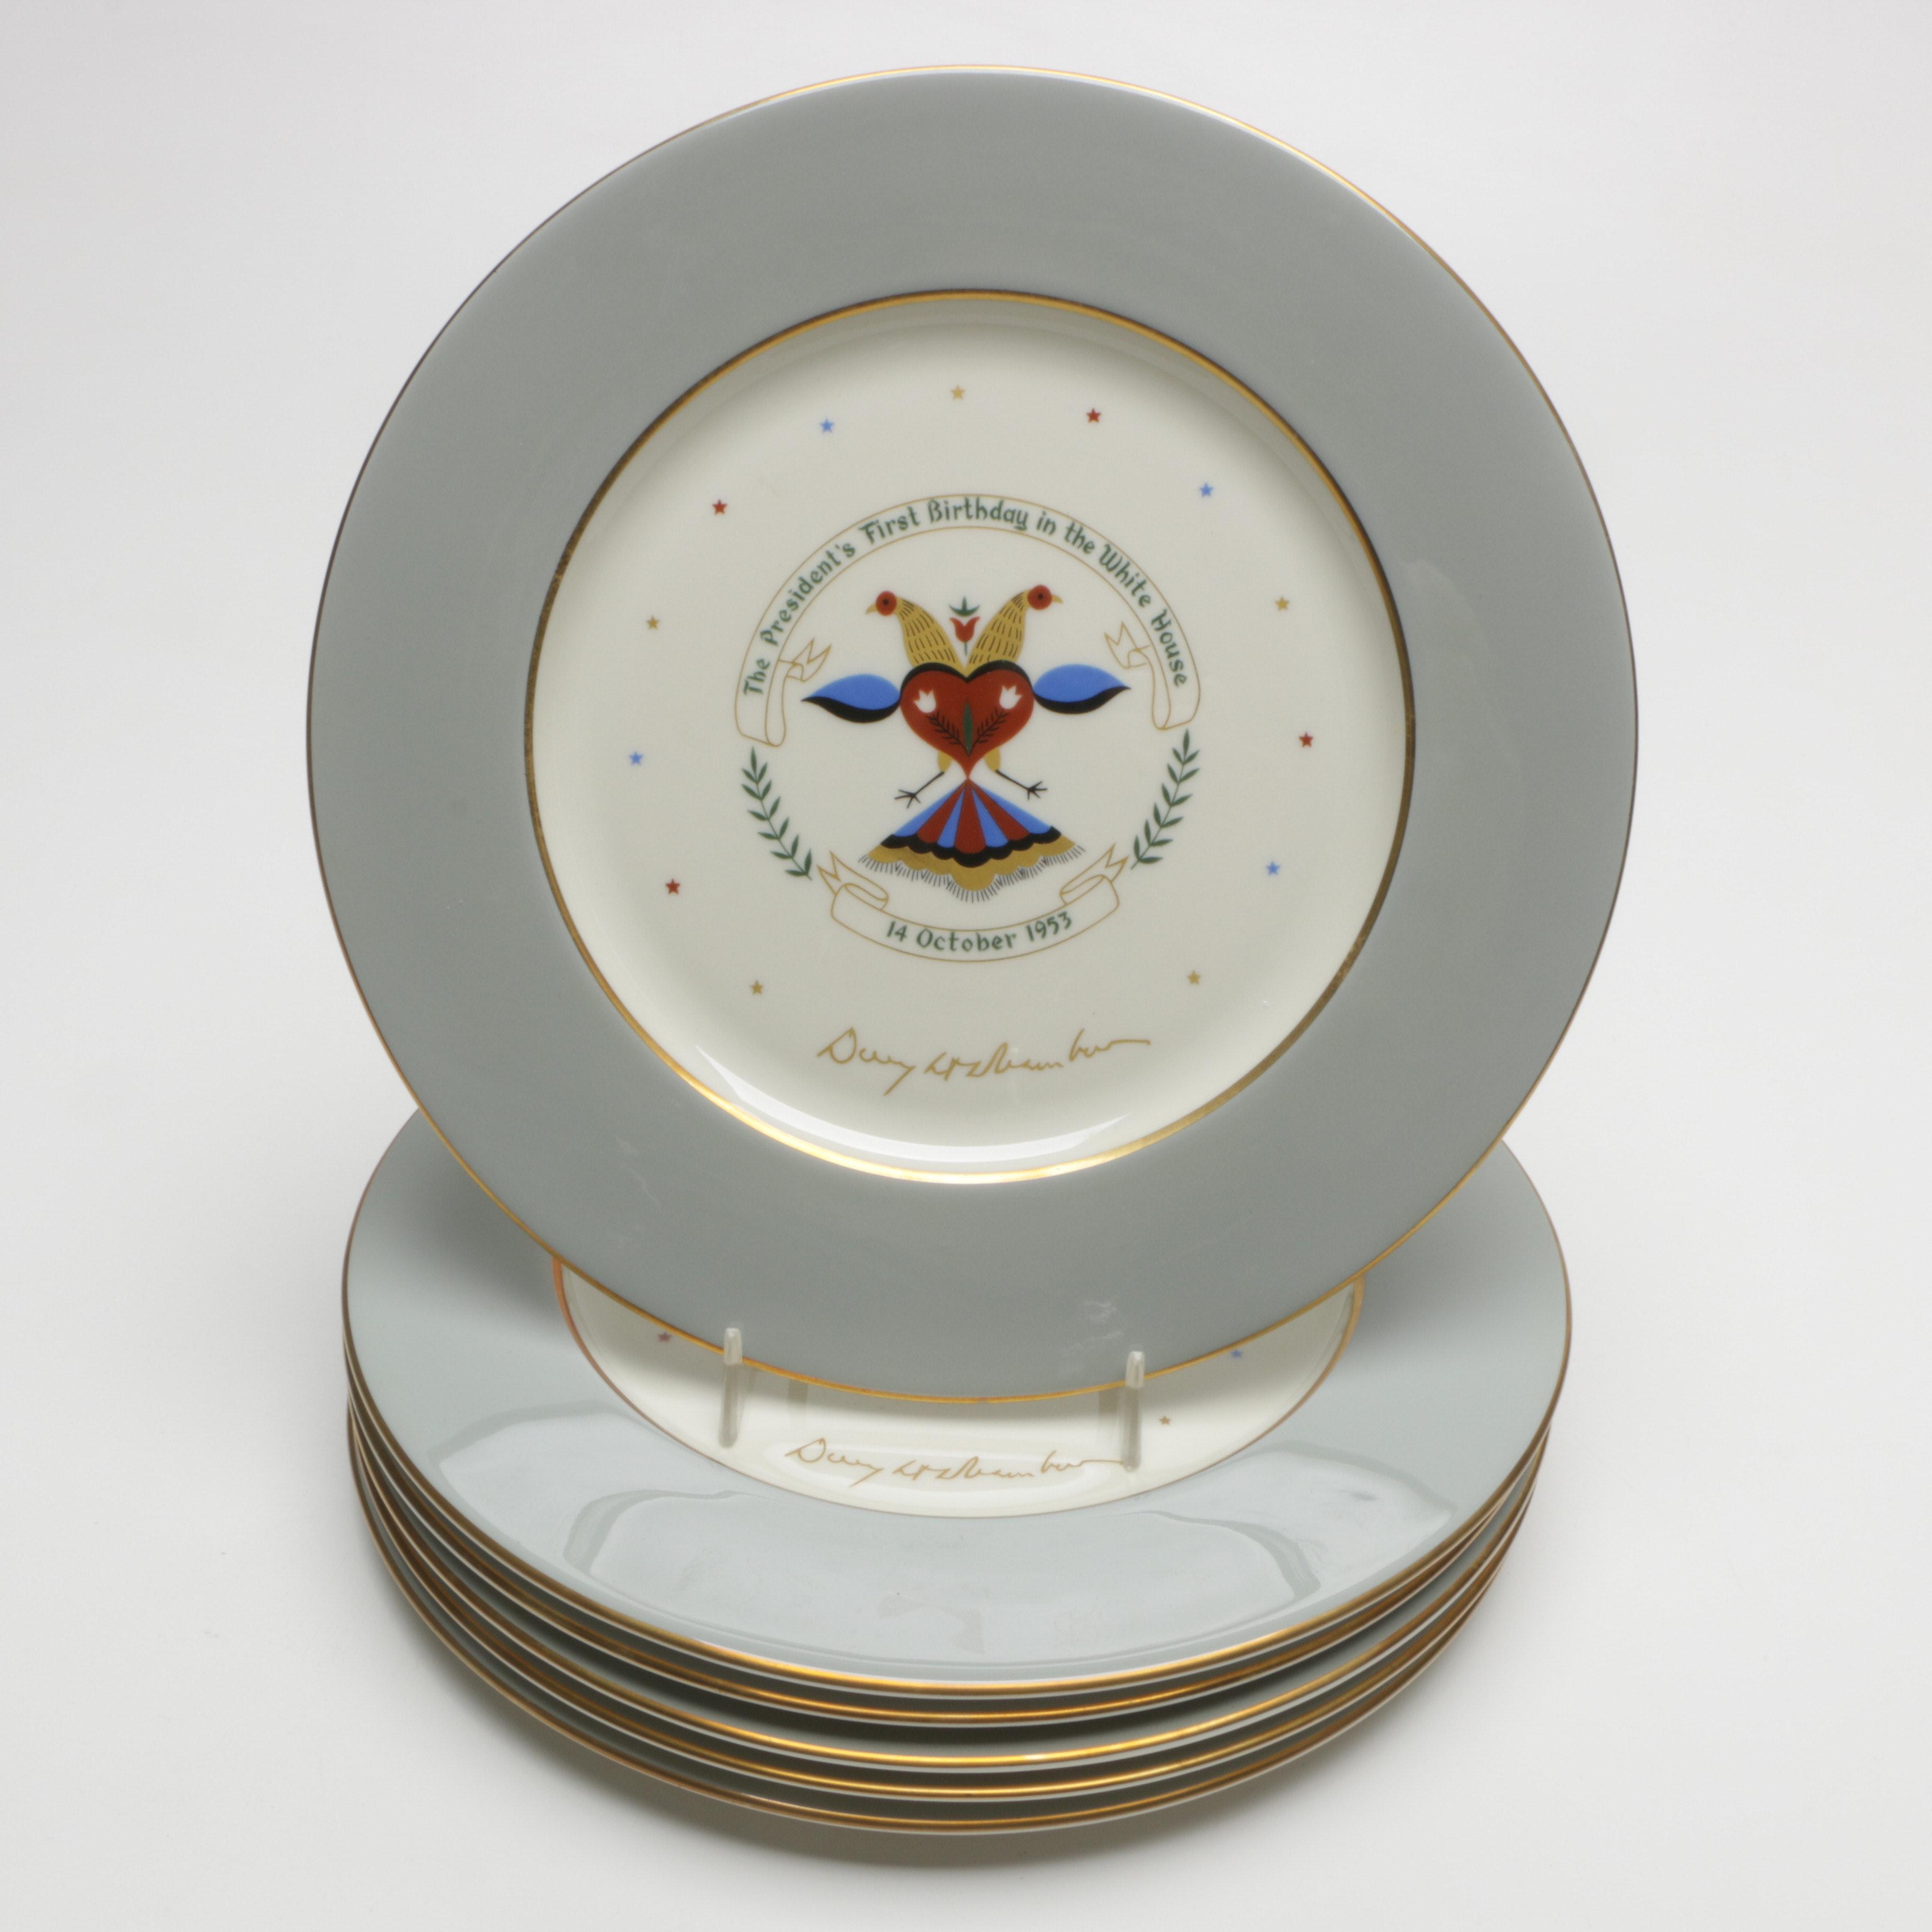 Castleton China Plates Commemorating Eisenhower's Birthday in the White House